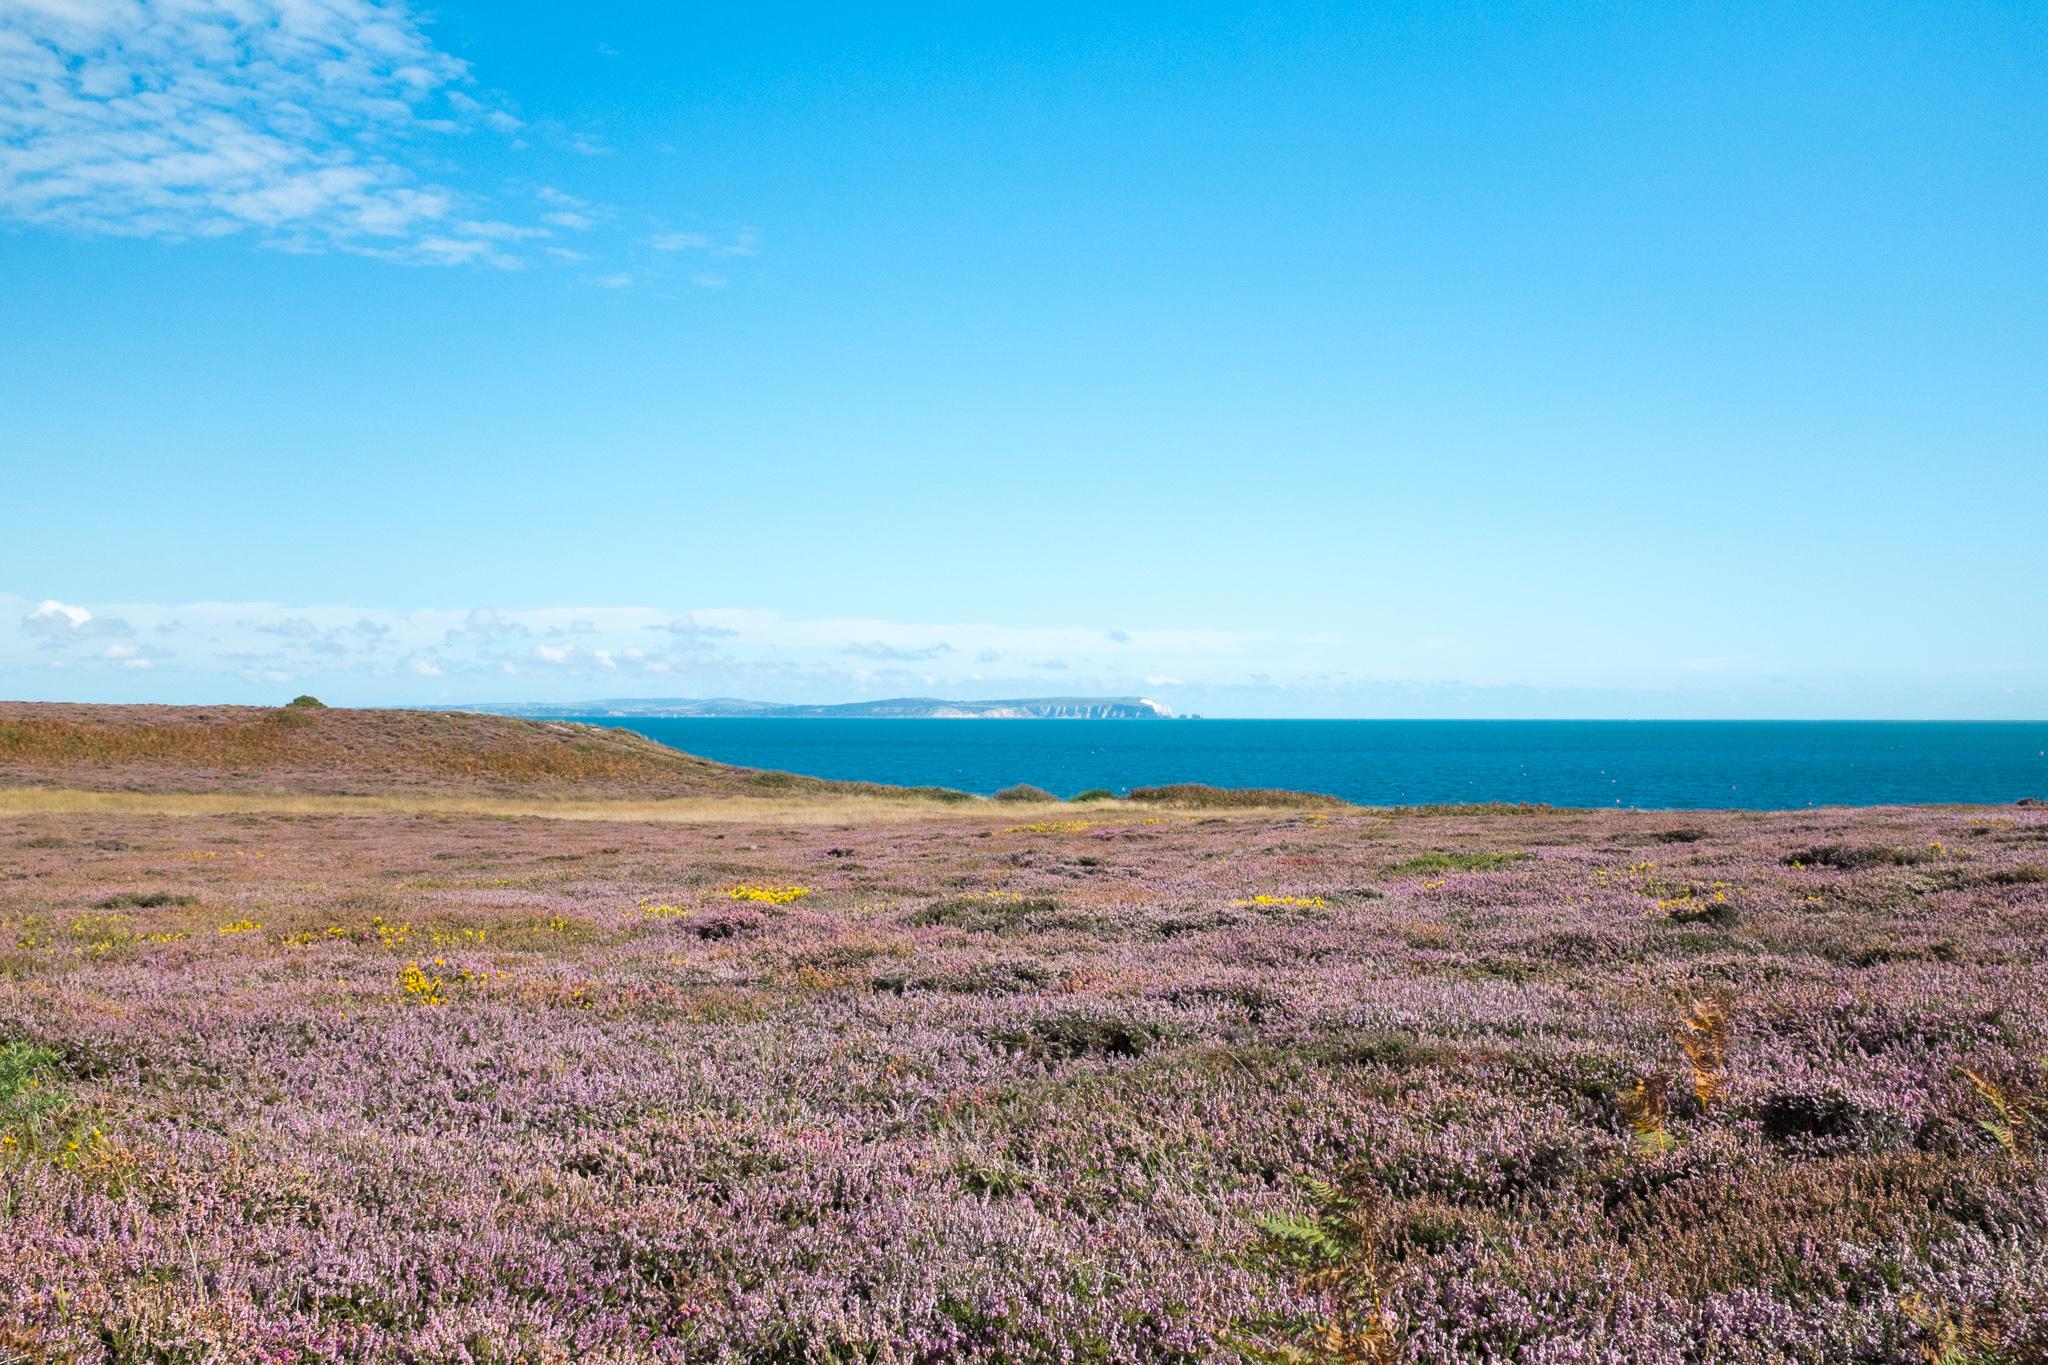 4846-nature-lymington-landscape.jpg